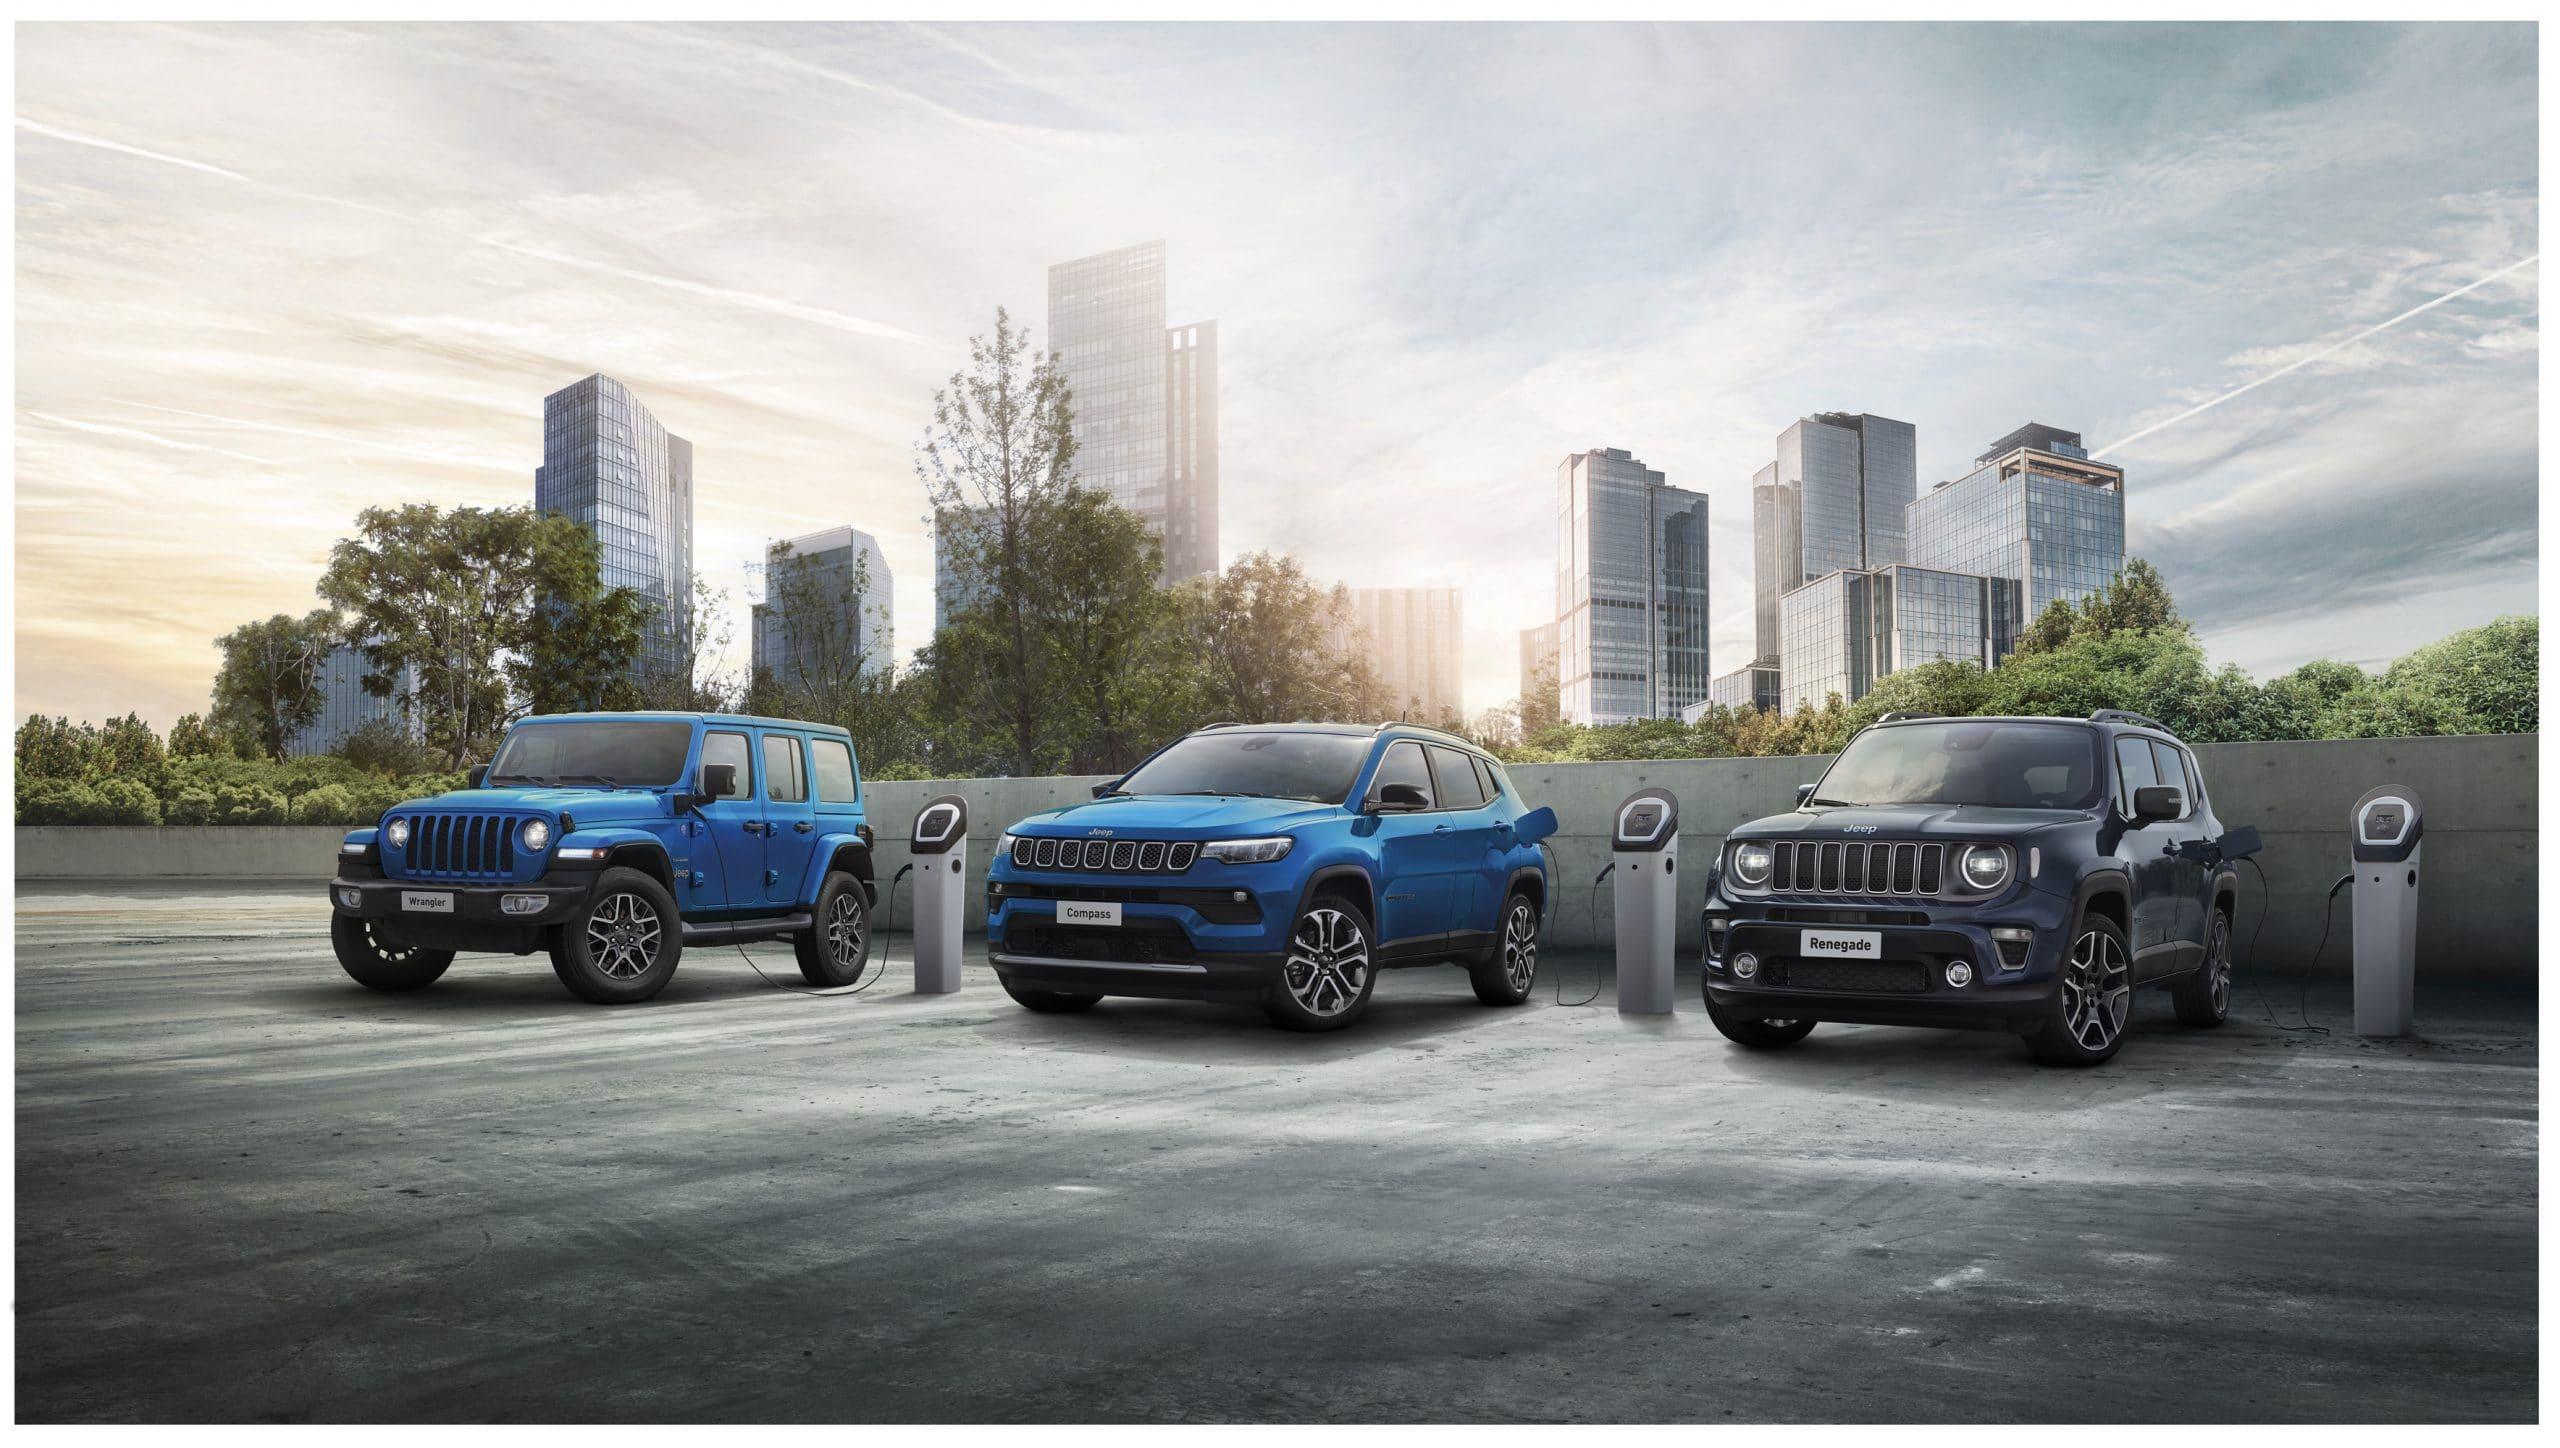 01 1st moment Jeep 4xe range scaled 12 ορόσημα, για τα 80α γενέθλια της Jeep Jeep, Jeep Cherokee, Jeep Compass, Jeep Gladiator, Jeep Grand Cherokee, Jeep Renegade, Jeep Willys, Jeep Wrangler, ειδήσεις, Νέα